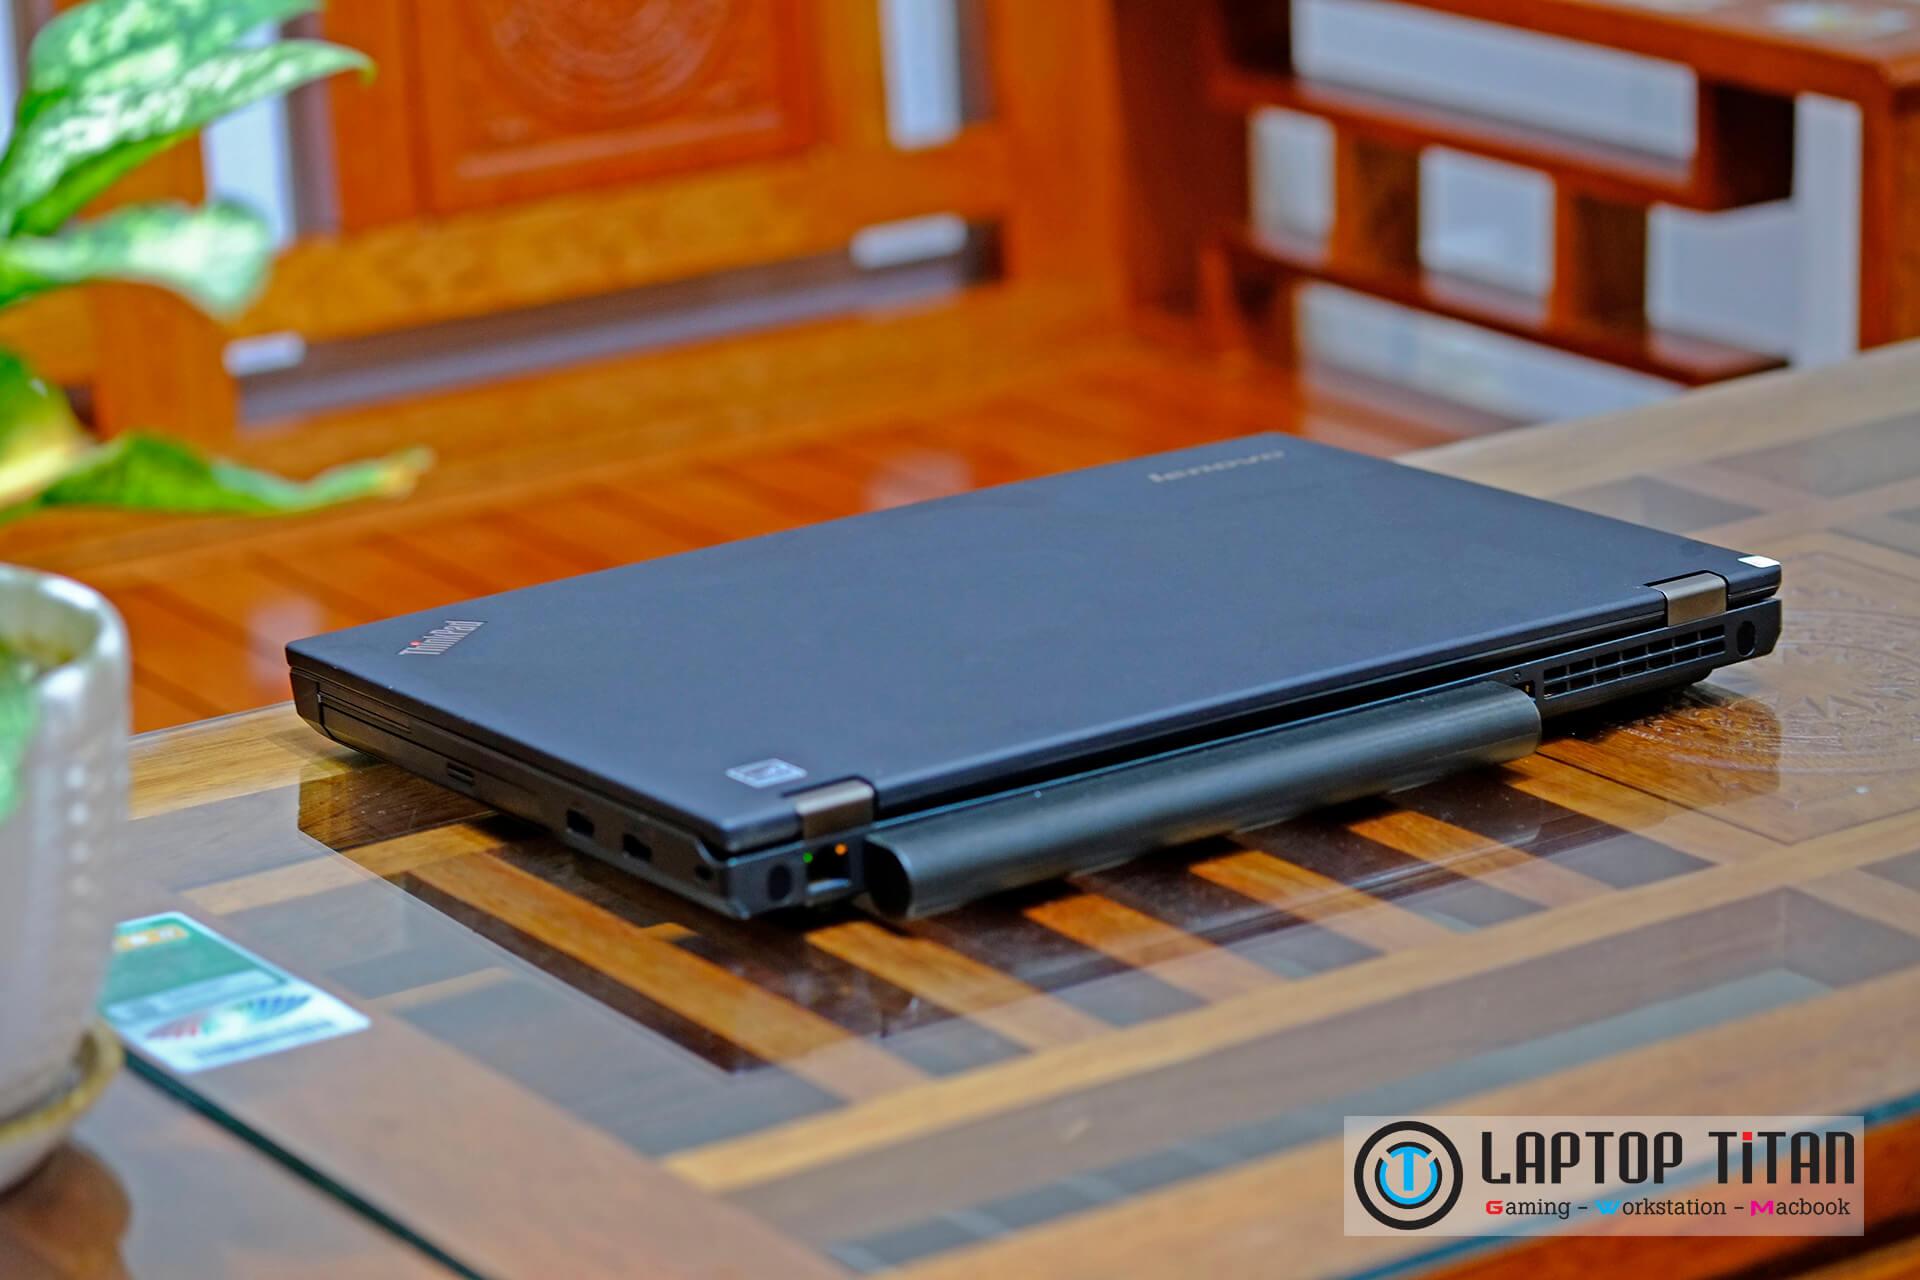 Lenovo Thinkpad W540 i7 4800MQ / 8GB / 256GB / K2100M / 15.6-inch 3K